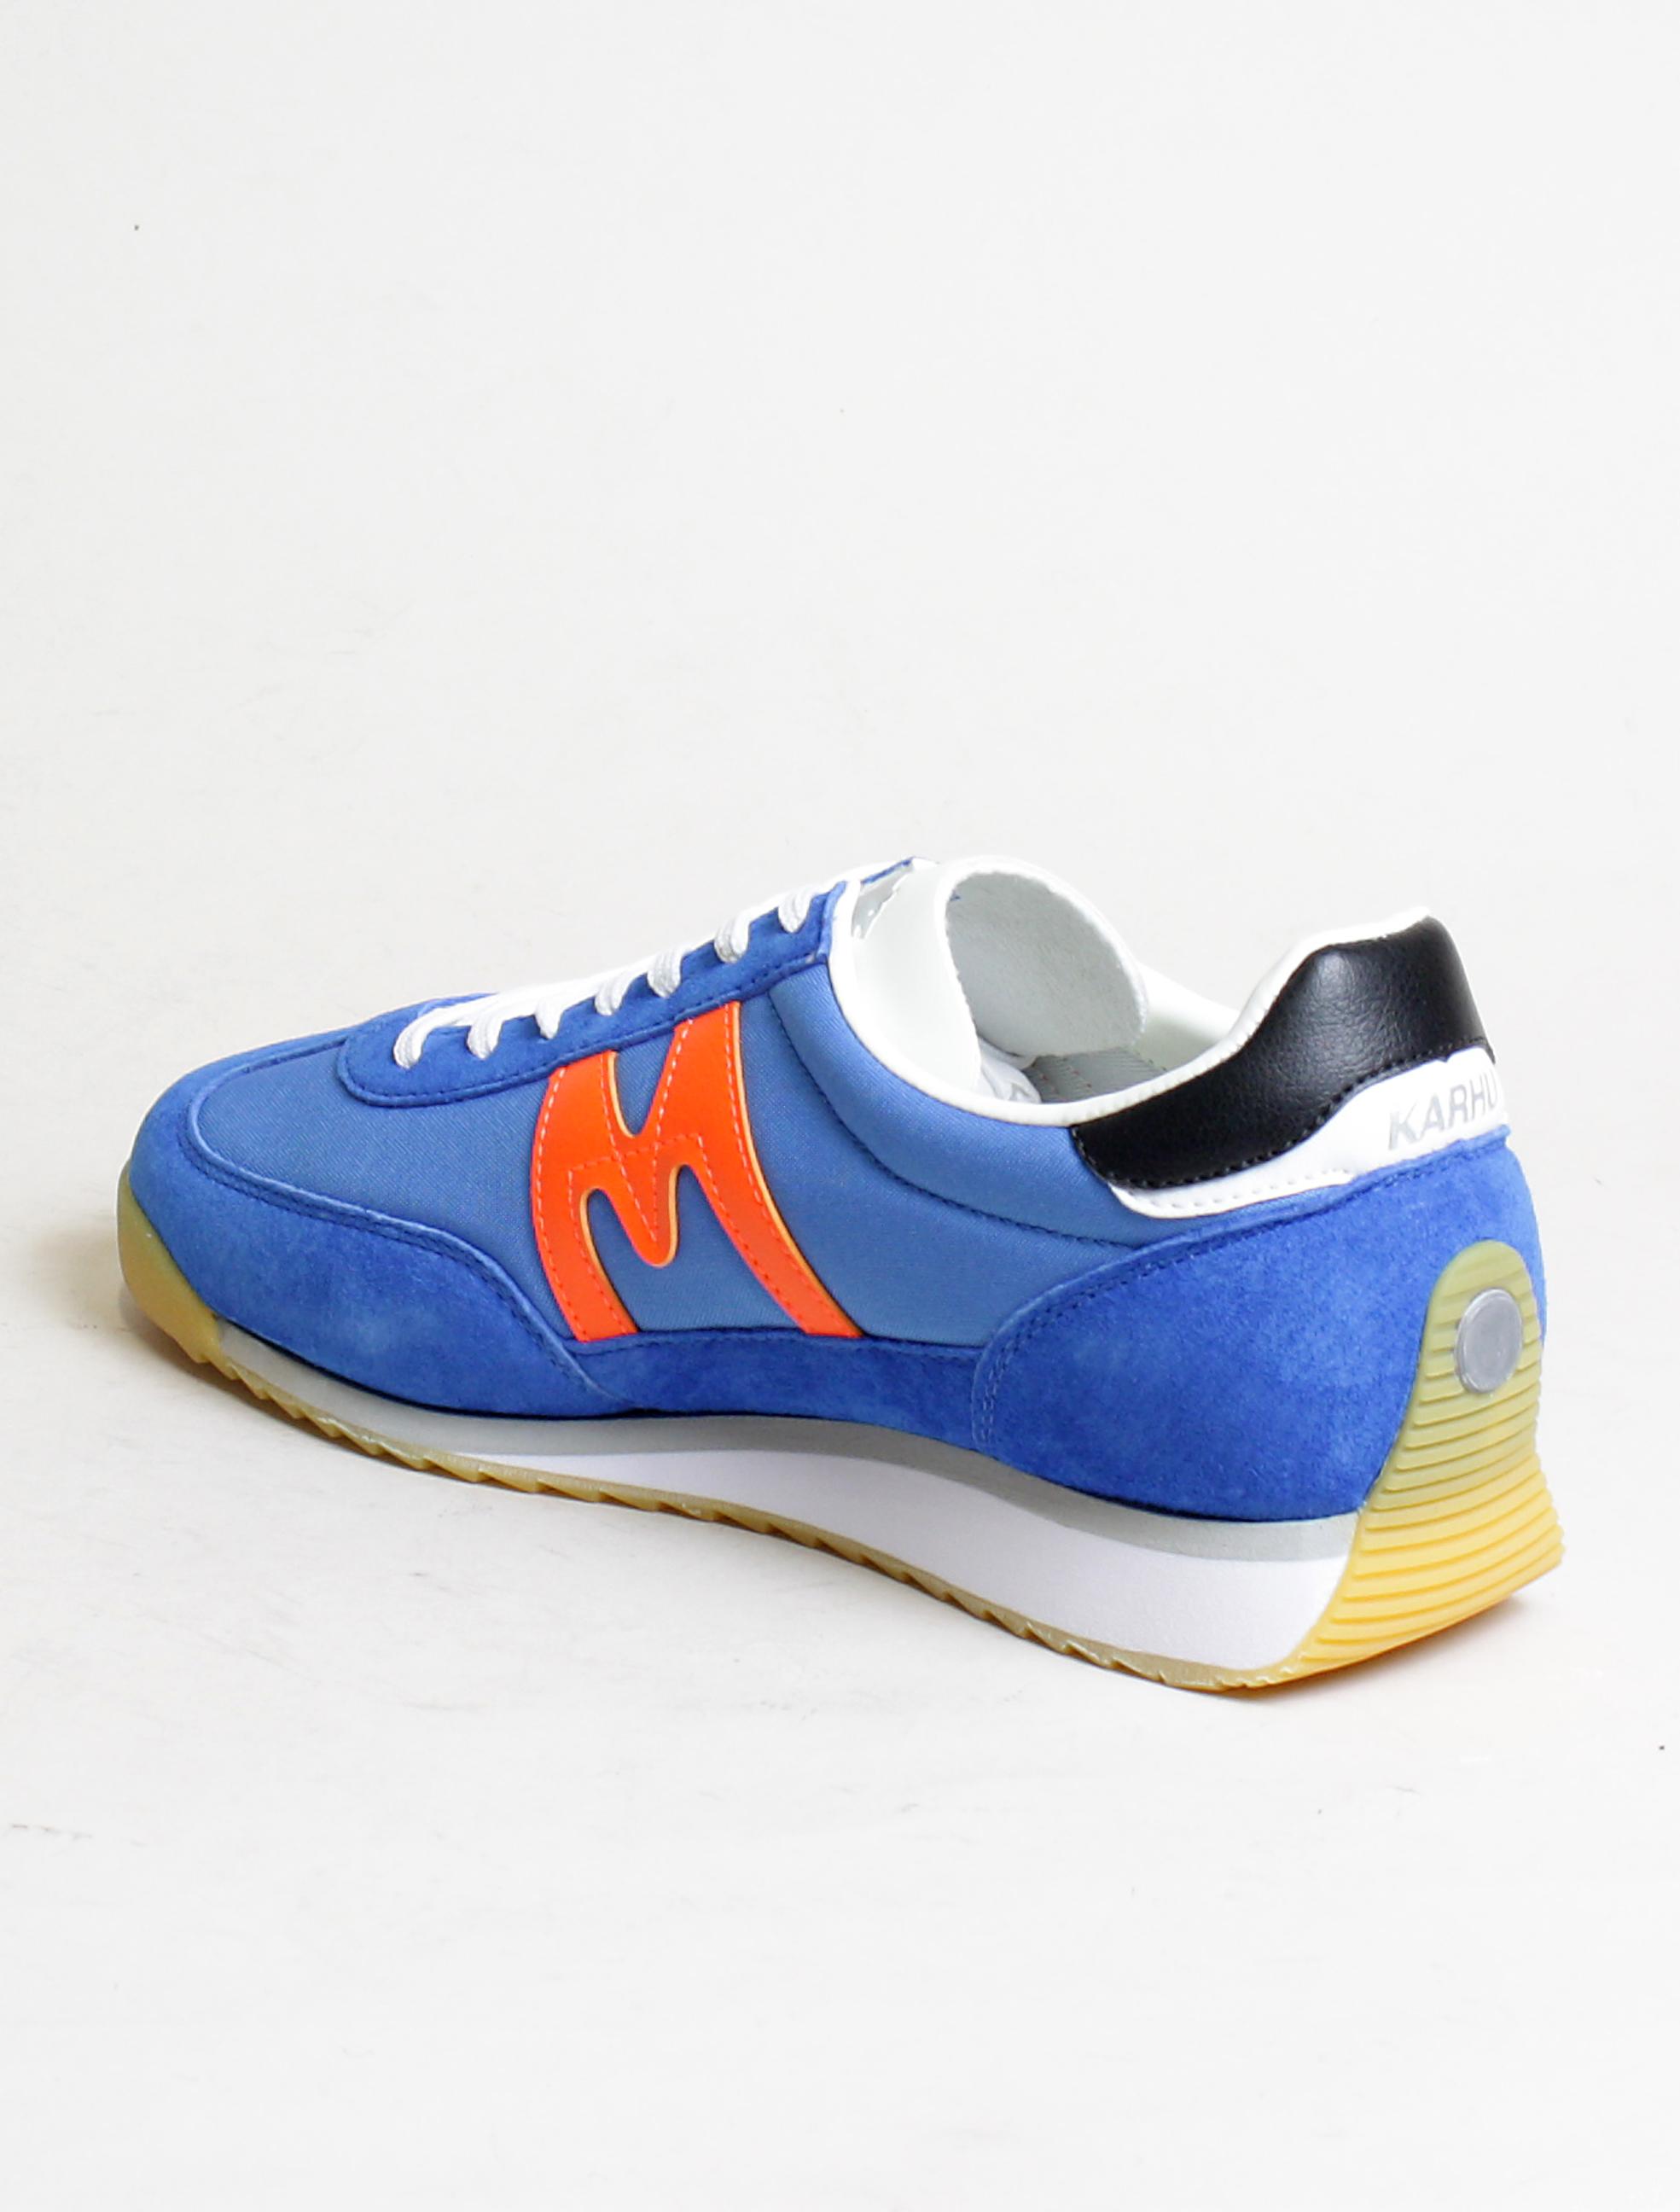 Karhu sneakers Championair Blue Aster Flame interno